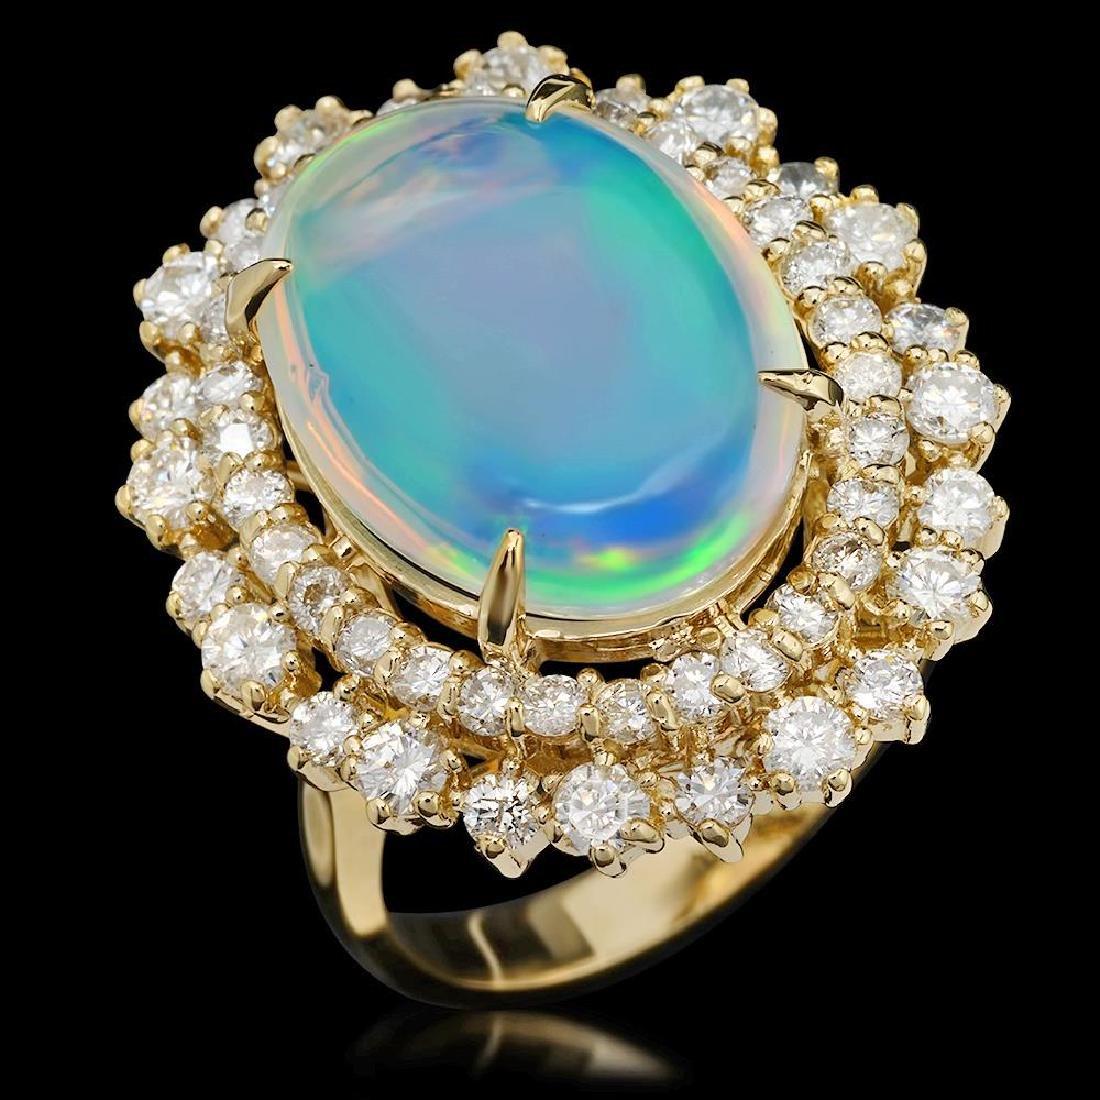 14K Gold 6.30ct Opal & 1.82ct Diamond Ring